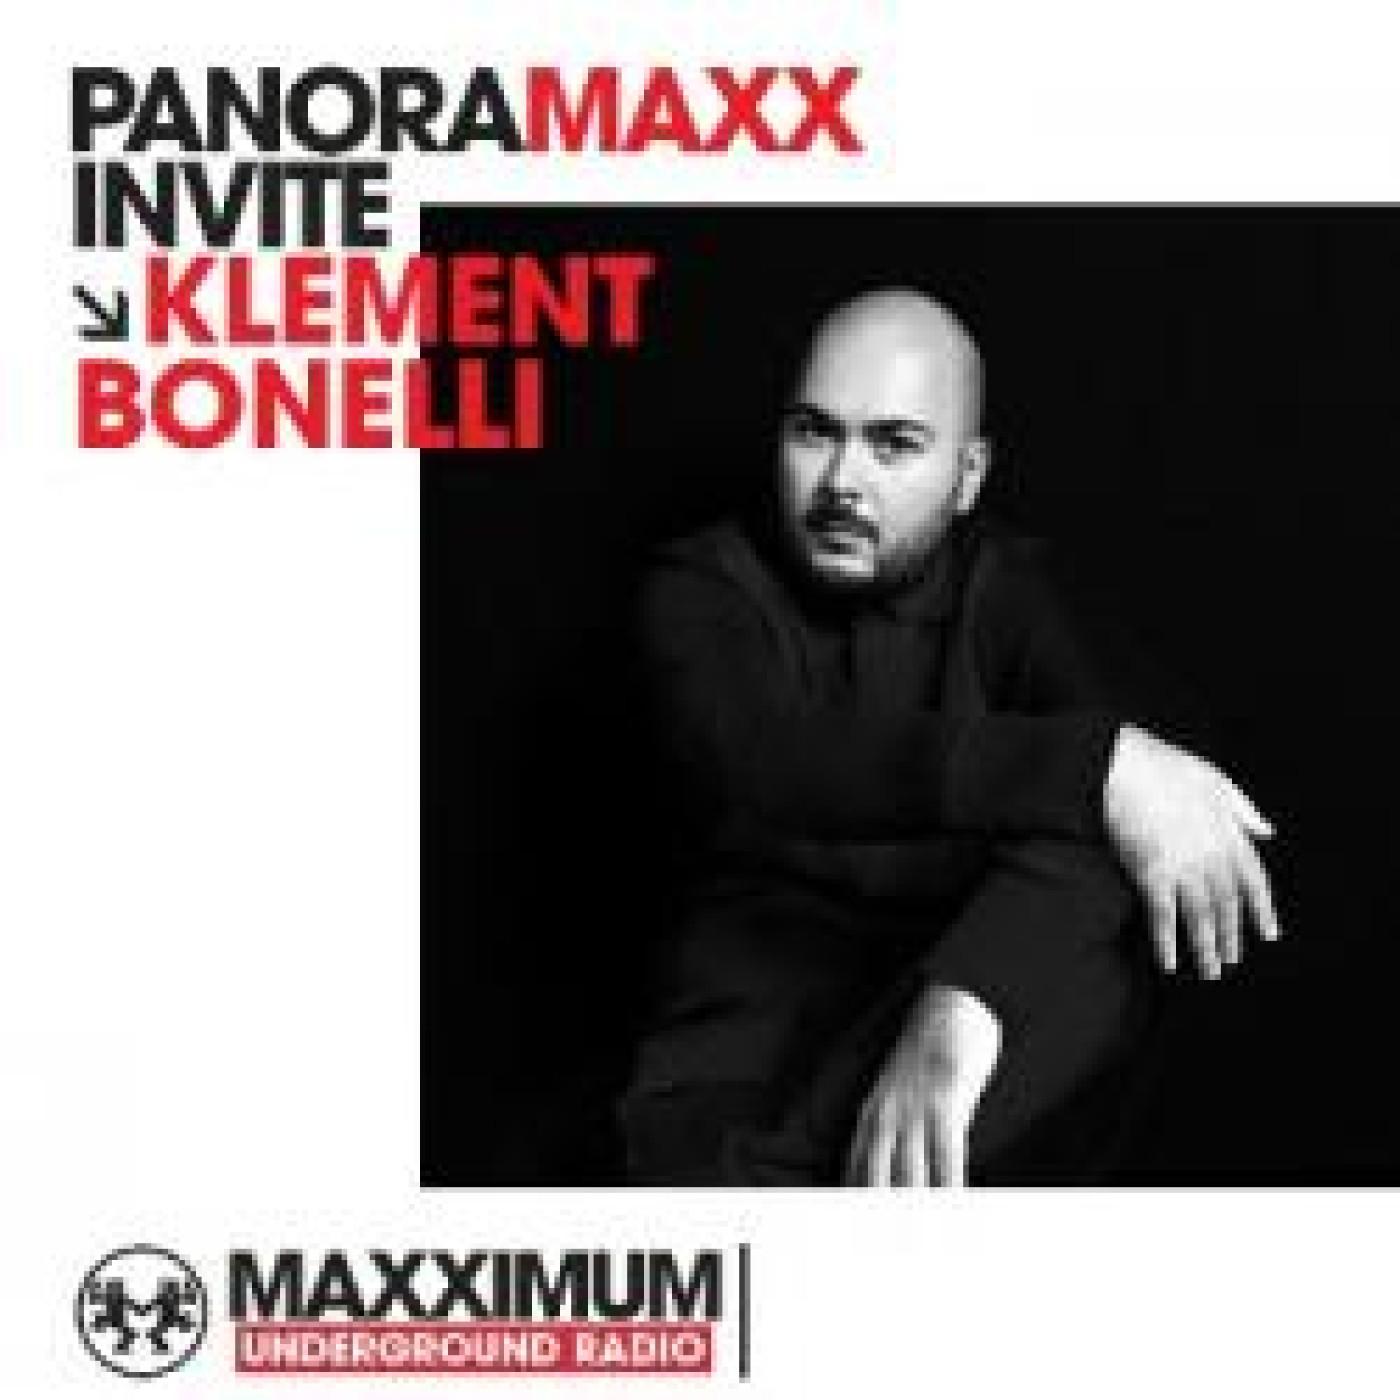 PANORAMAXX : KLEMENT BONELLI